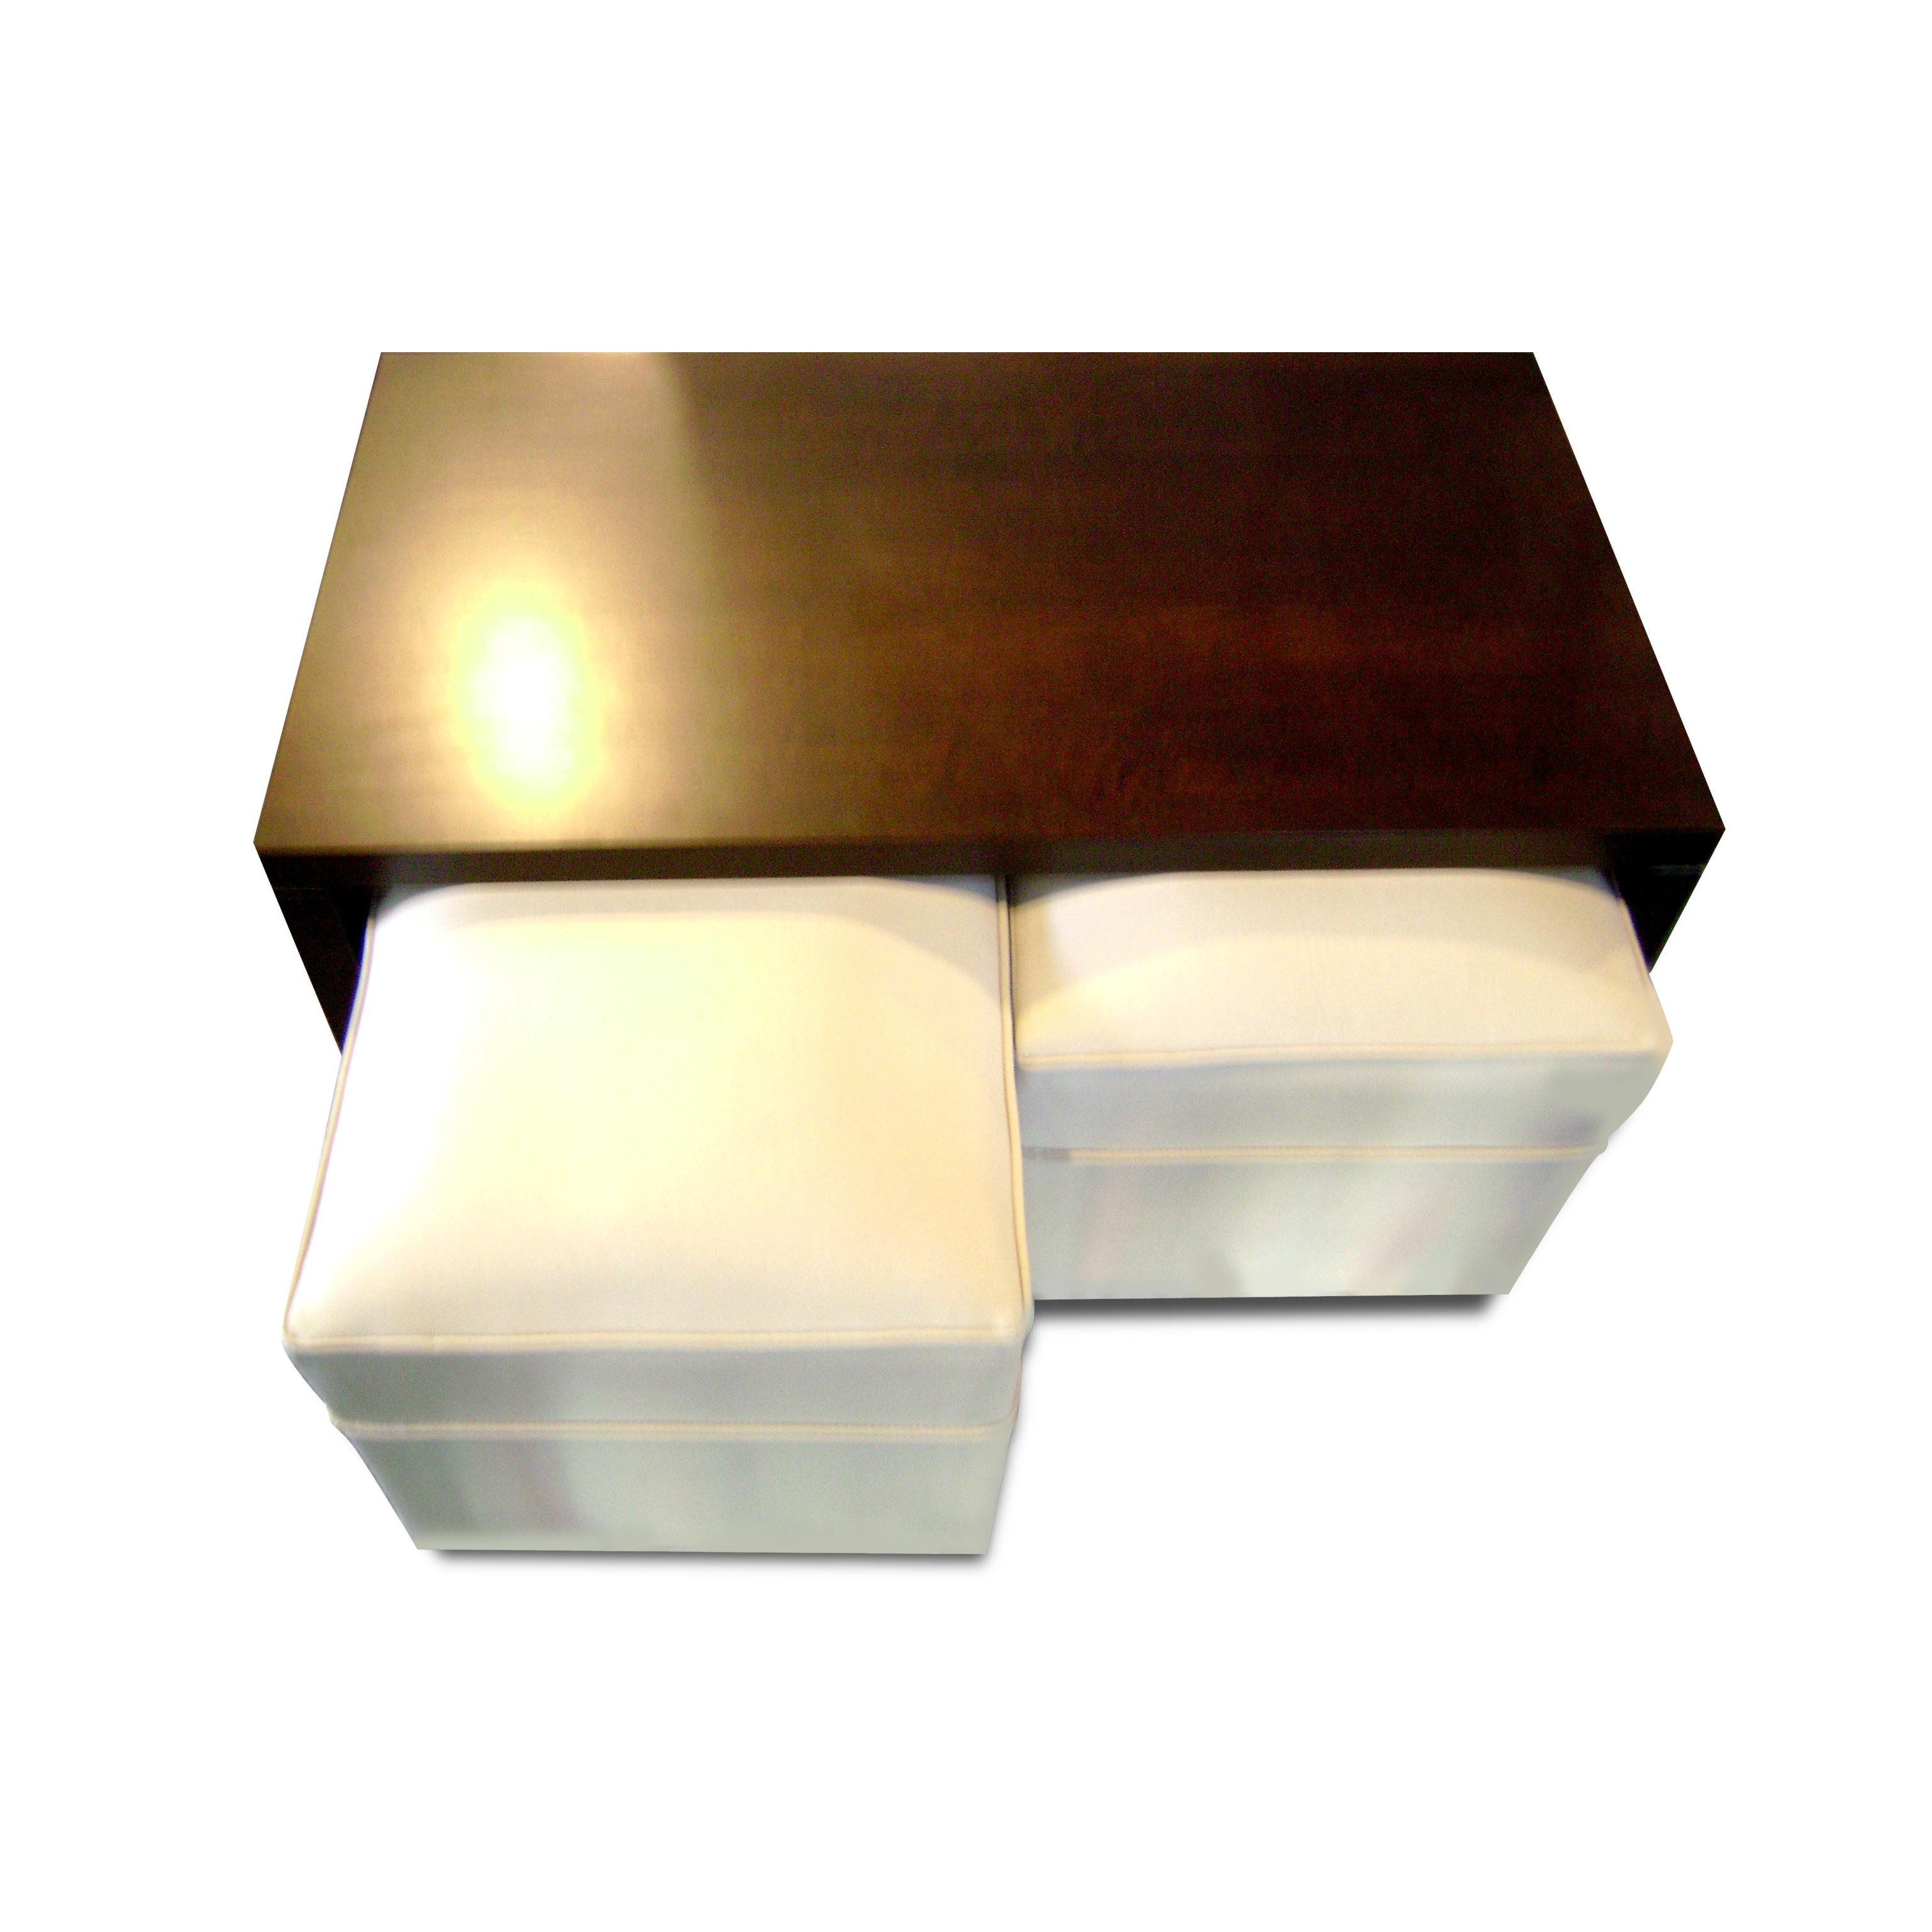 Mesa Ratona Quadratto F Brica De Muebles Grupo Veta # Muebles Cedro Y Nogal